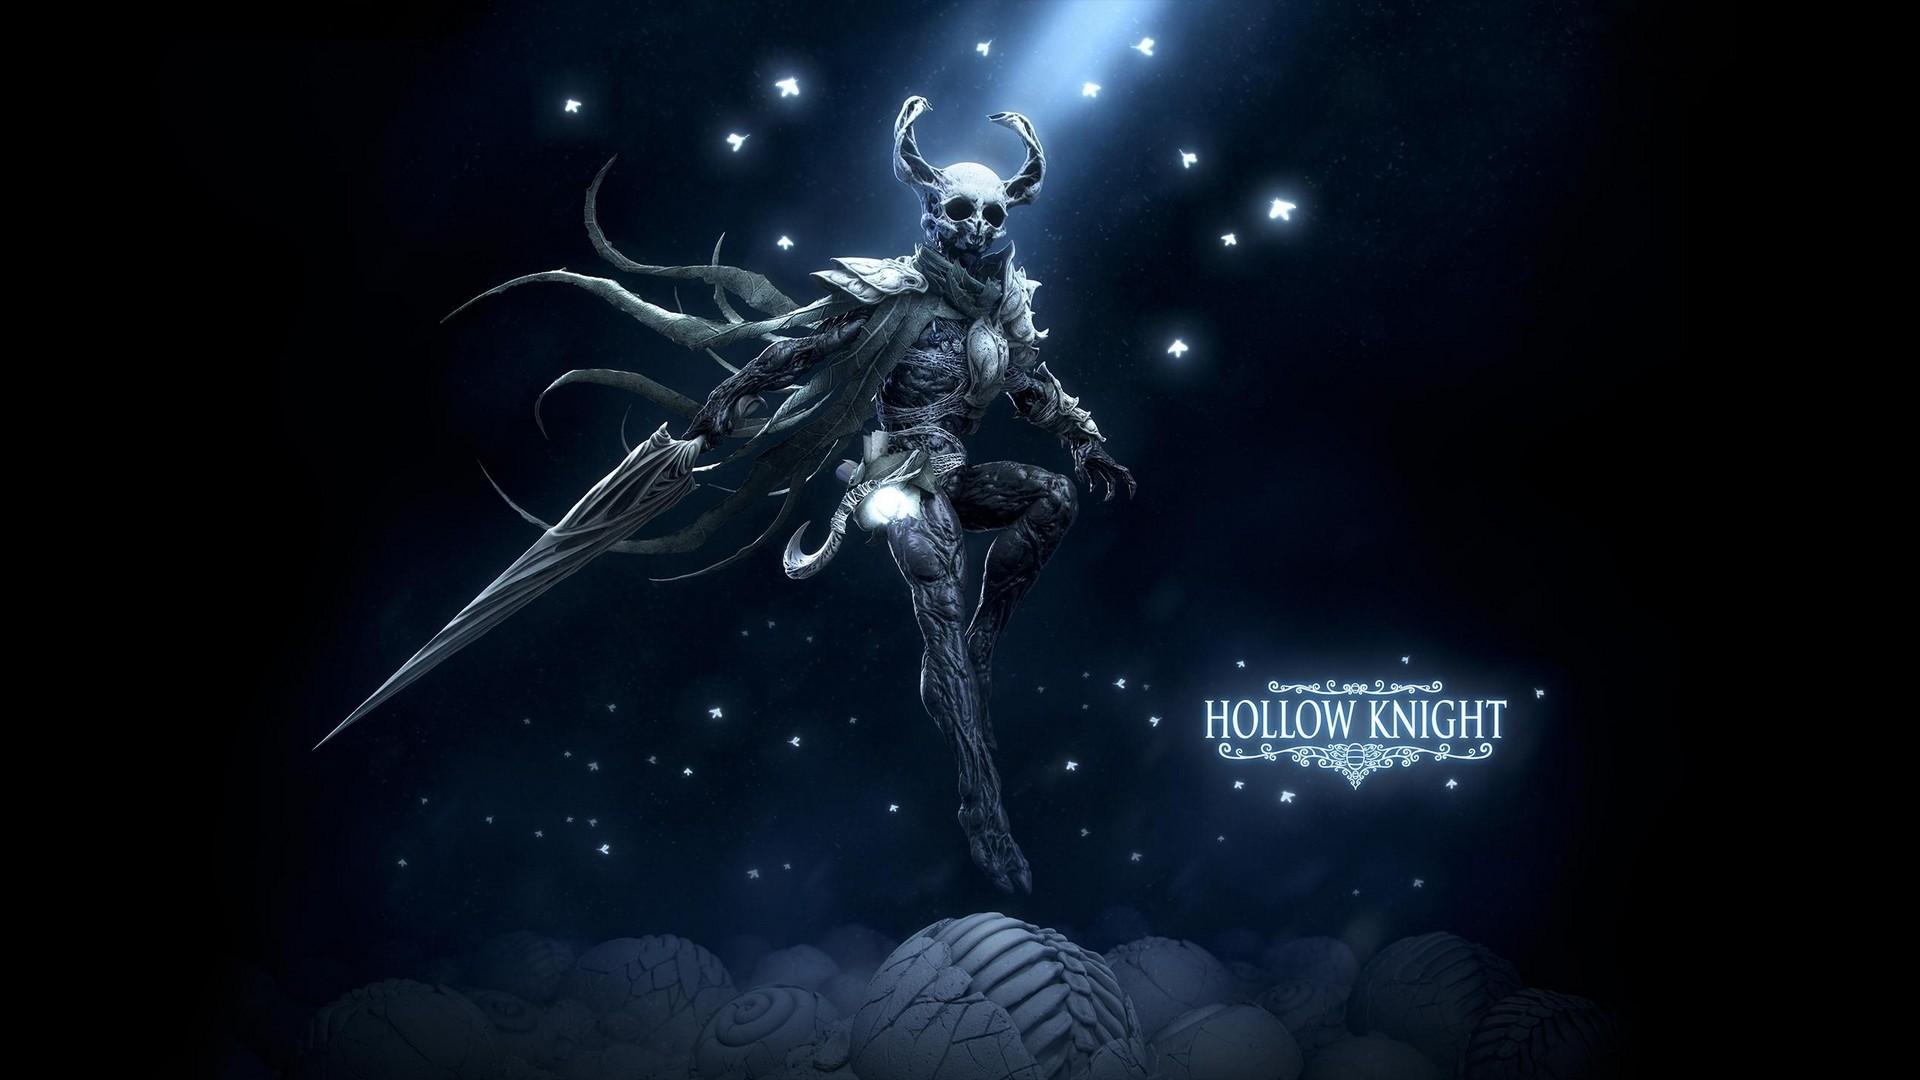 Hollow Knight HD Wallpaper